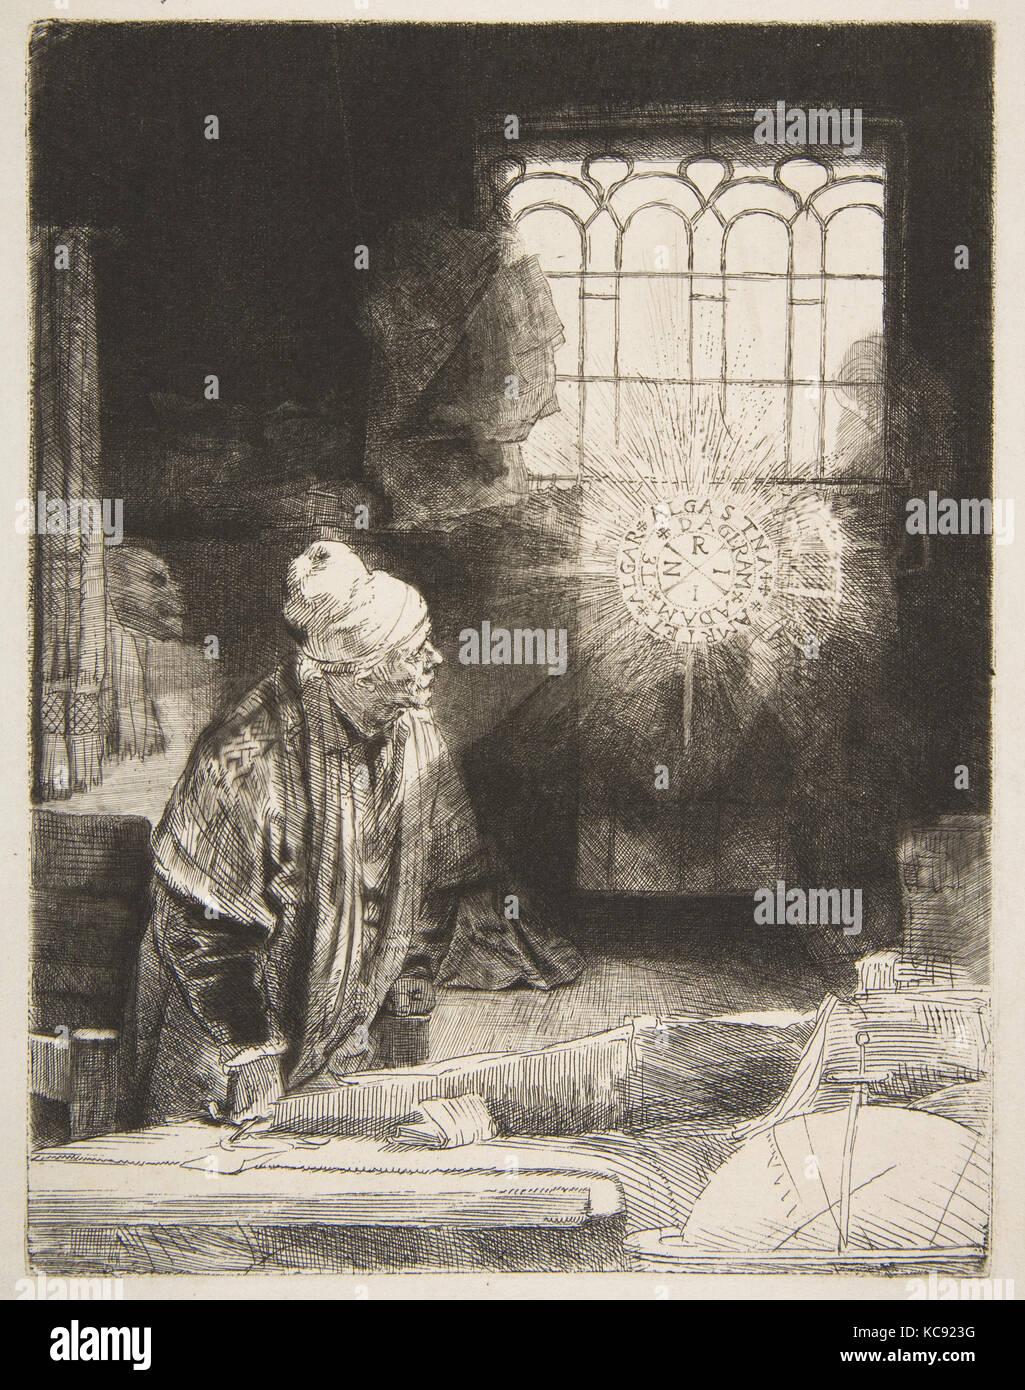 Faust, ca. 1652, Etching, drypoint, and burin, Prints, Rembrandt (Rembrandt van Rijn) (Dutch, Leiden 1606–1669 Amsterdam - Stock Image